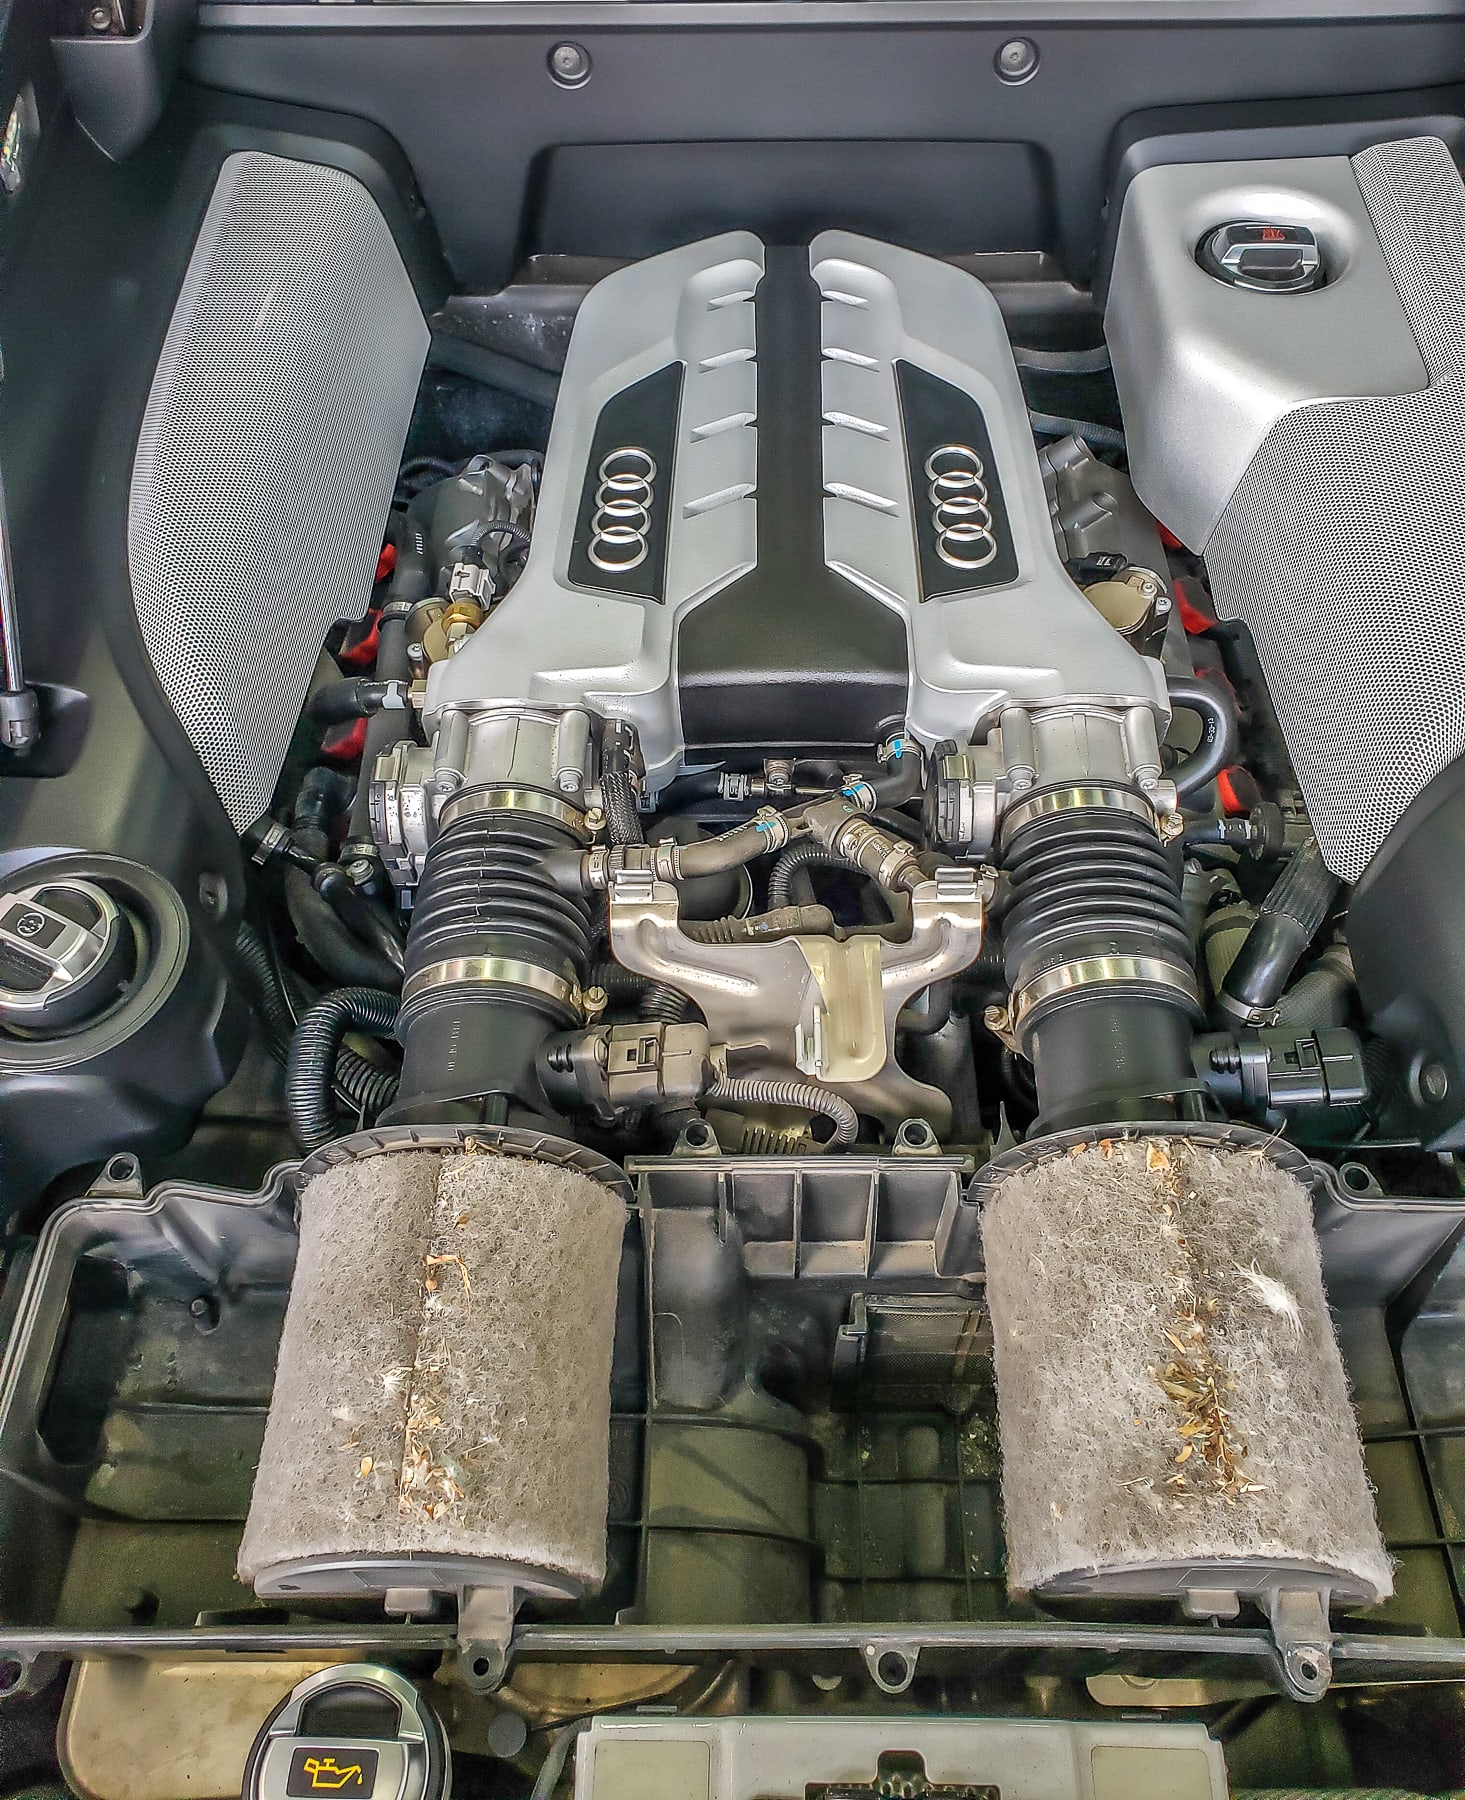 2014 Audi R8, Maintenance Service